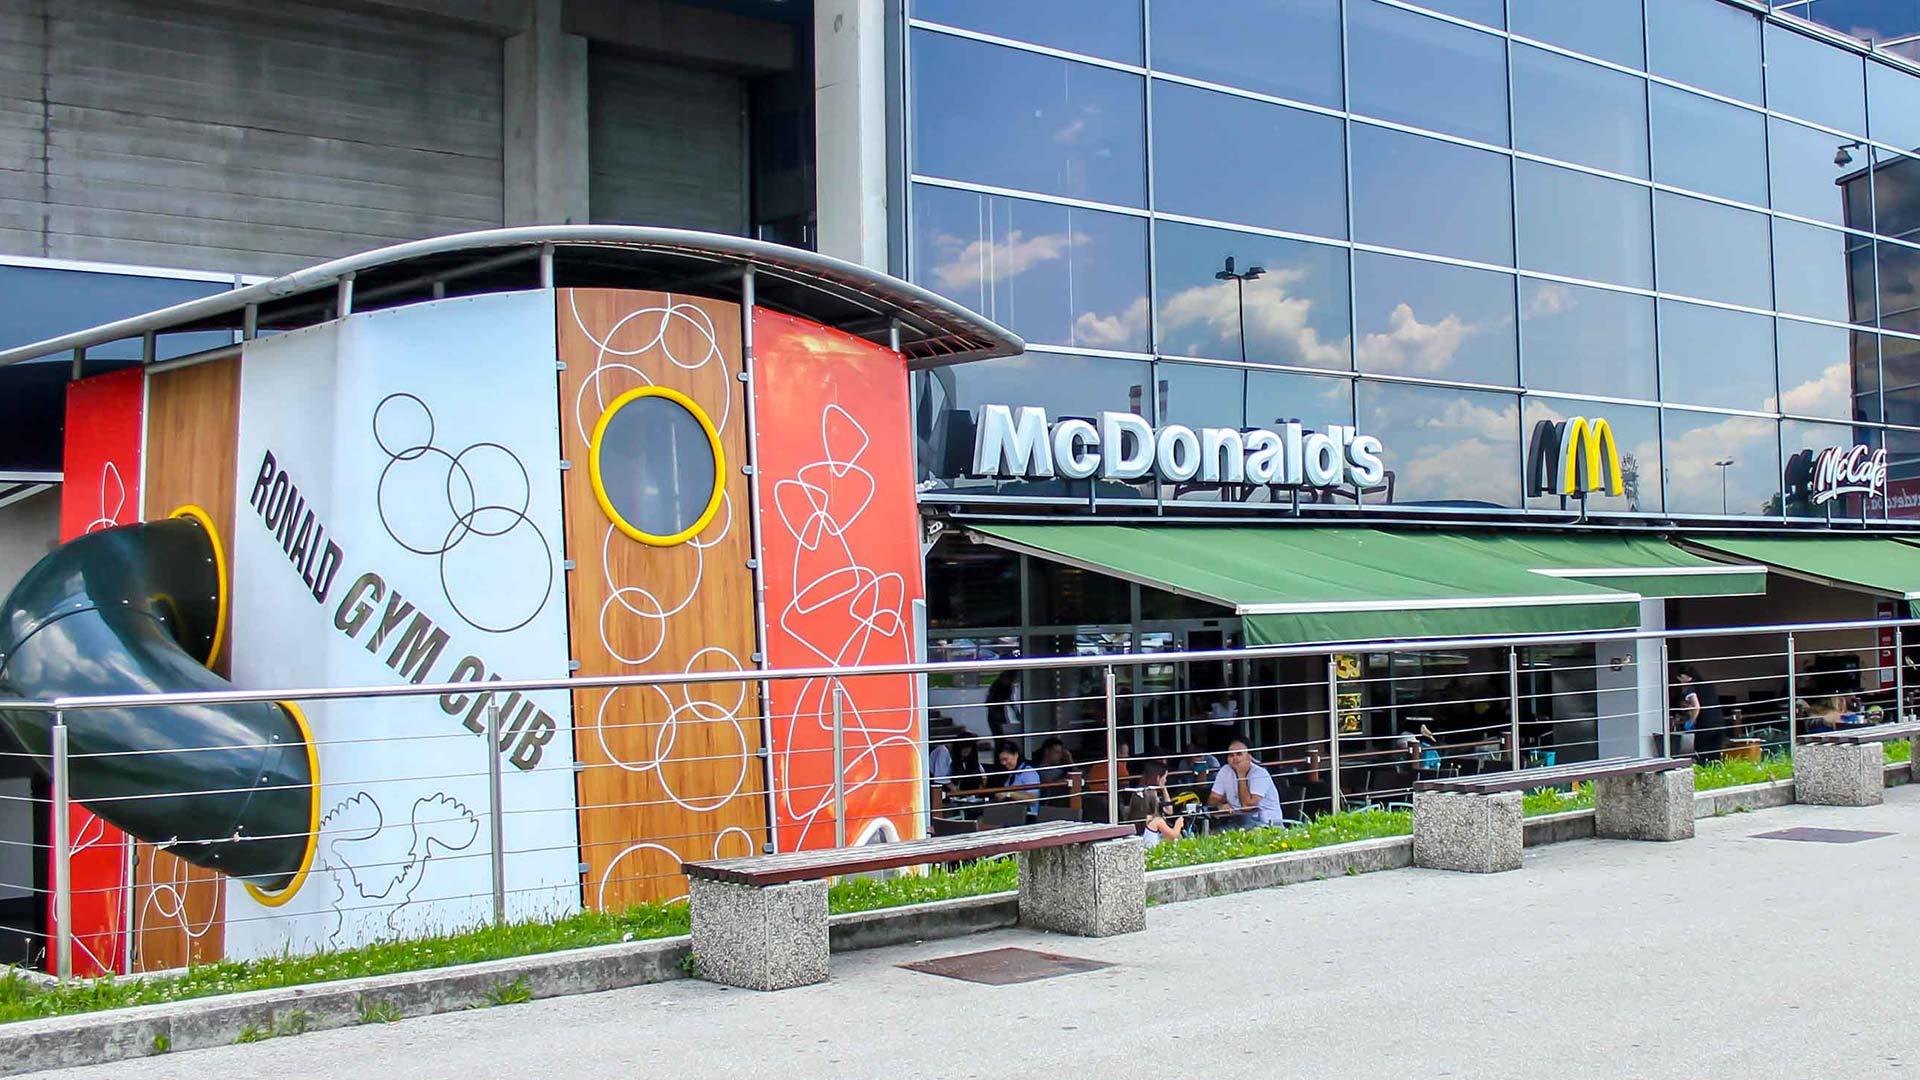 439-hero-McDonald's_Kolosej-zunaj